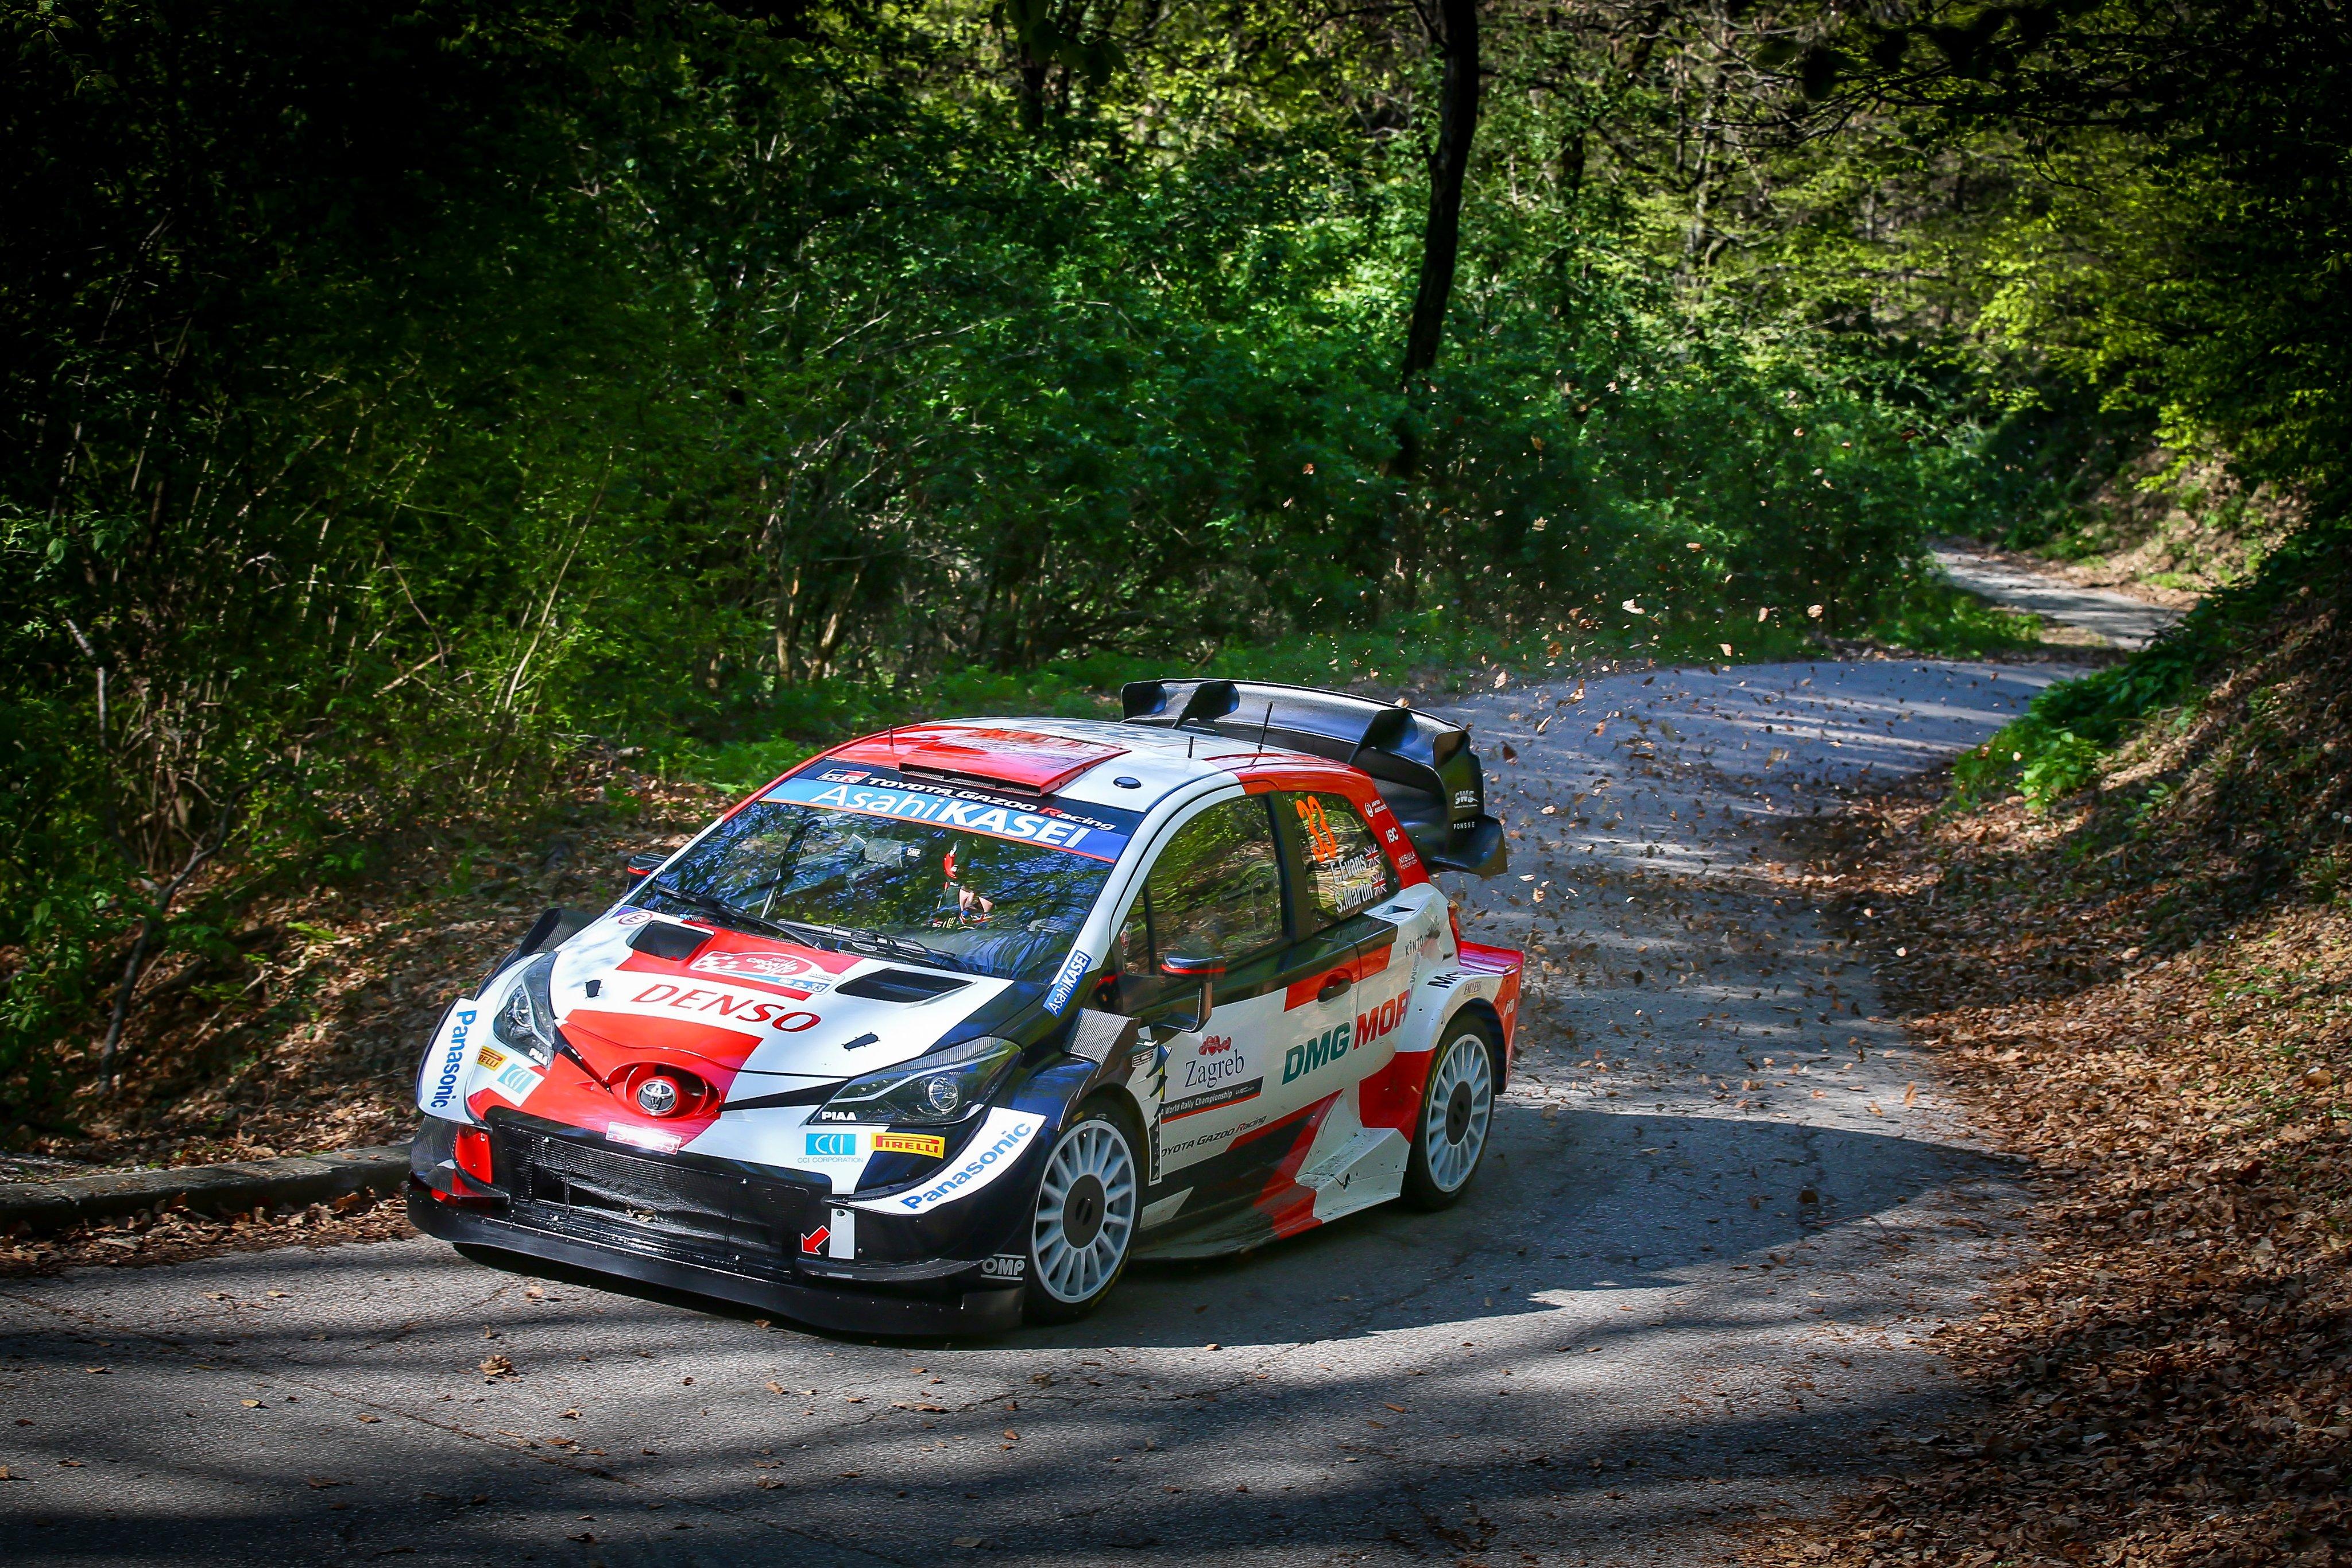 WRC: 46º Croatia Rally [22-25 Abril] - Página 3 Ezj8LNcXoAEwB6V?format=jpg&name=4096x4096